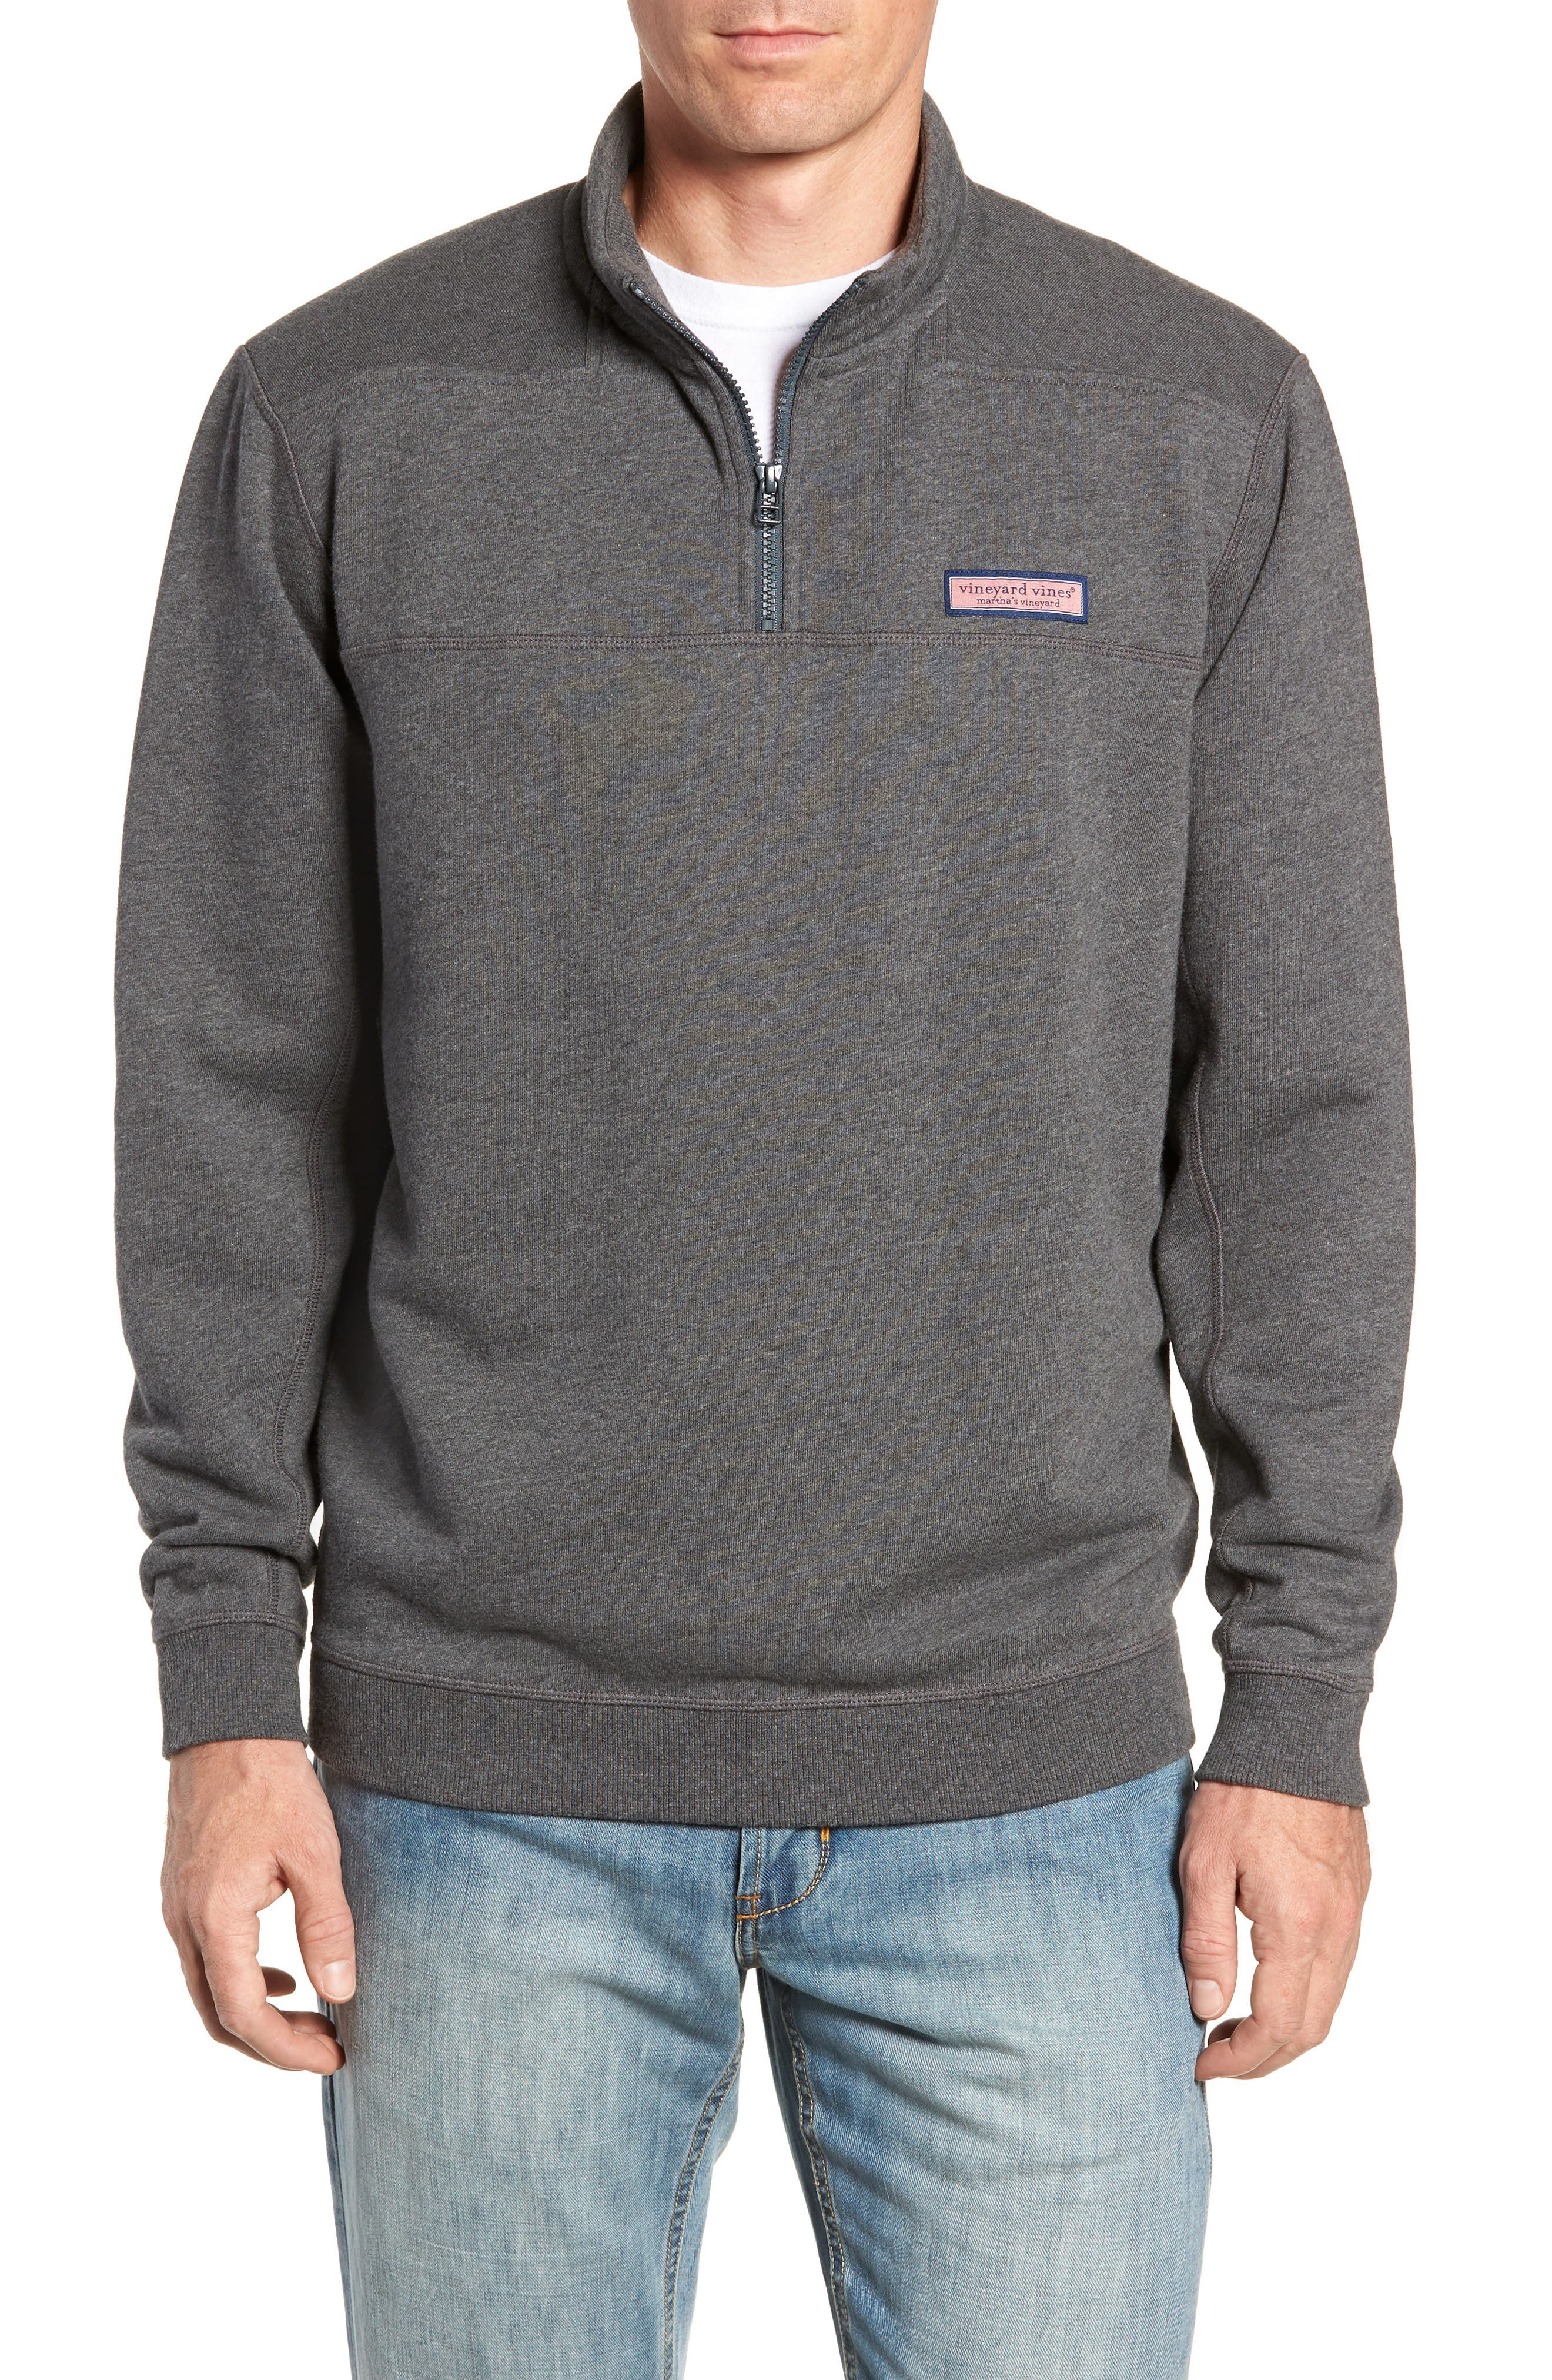 Quarter Zip Fleece Pullover,                             Main thumbnail 1, color,                             PEBBLE